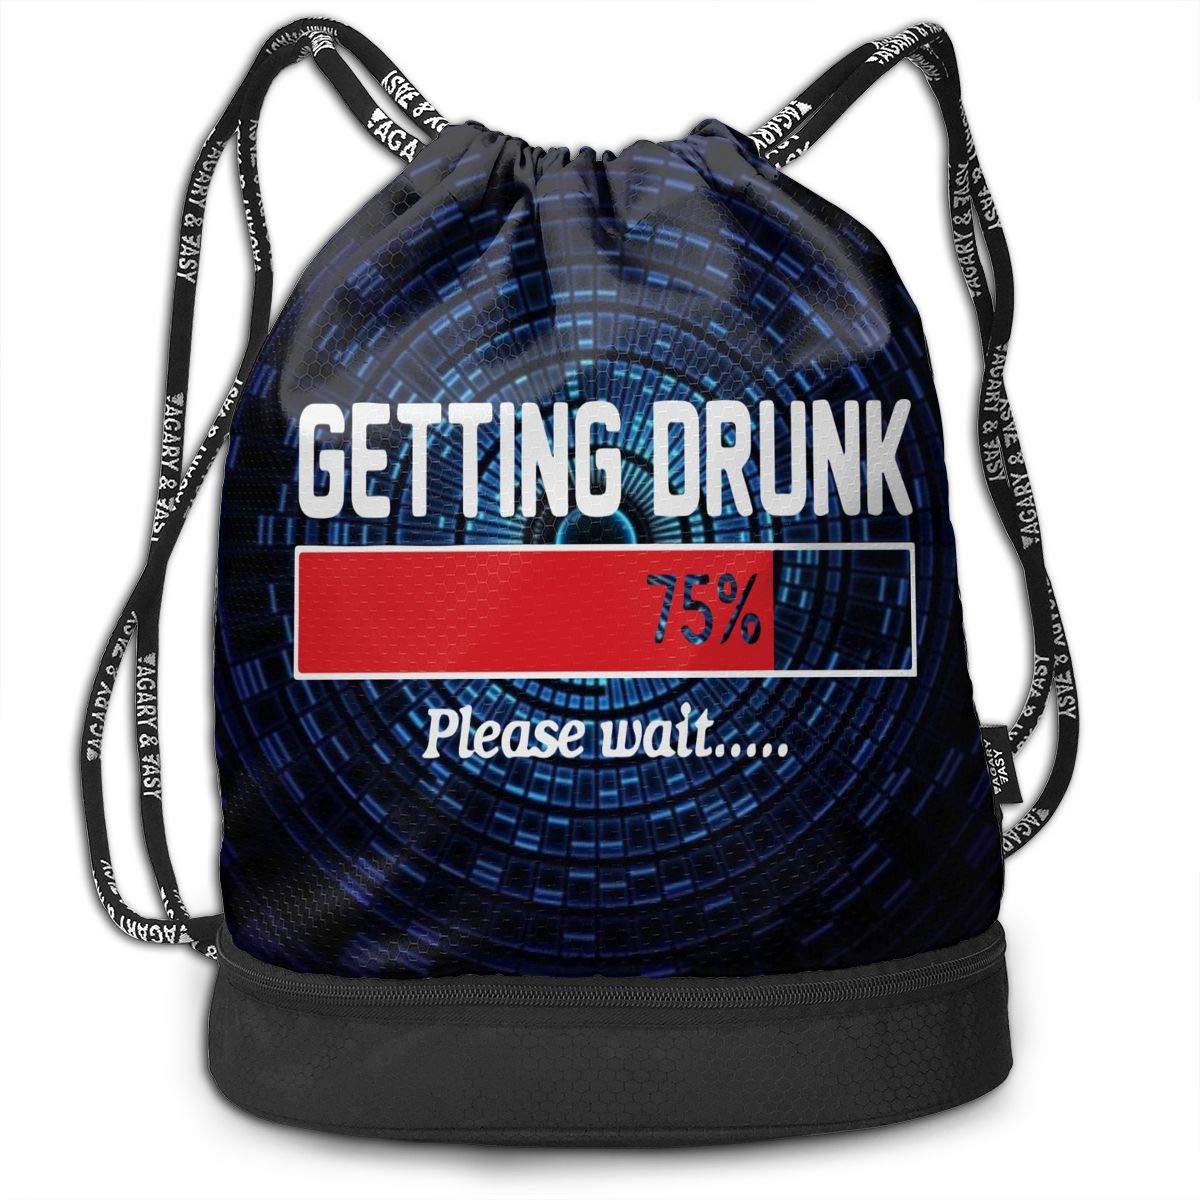 Getting Drunk Men /& Women Drawstring Pack Beam Mouth Sports Sackpack Shoulder Bags